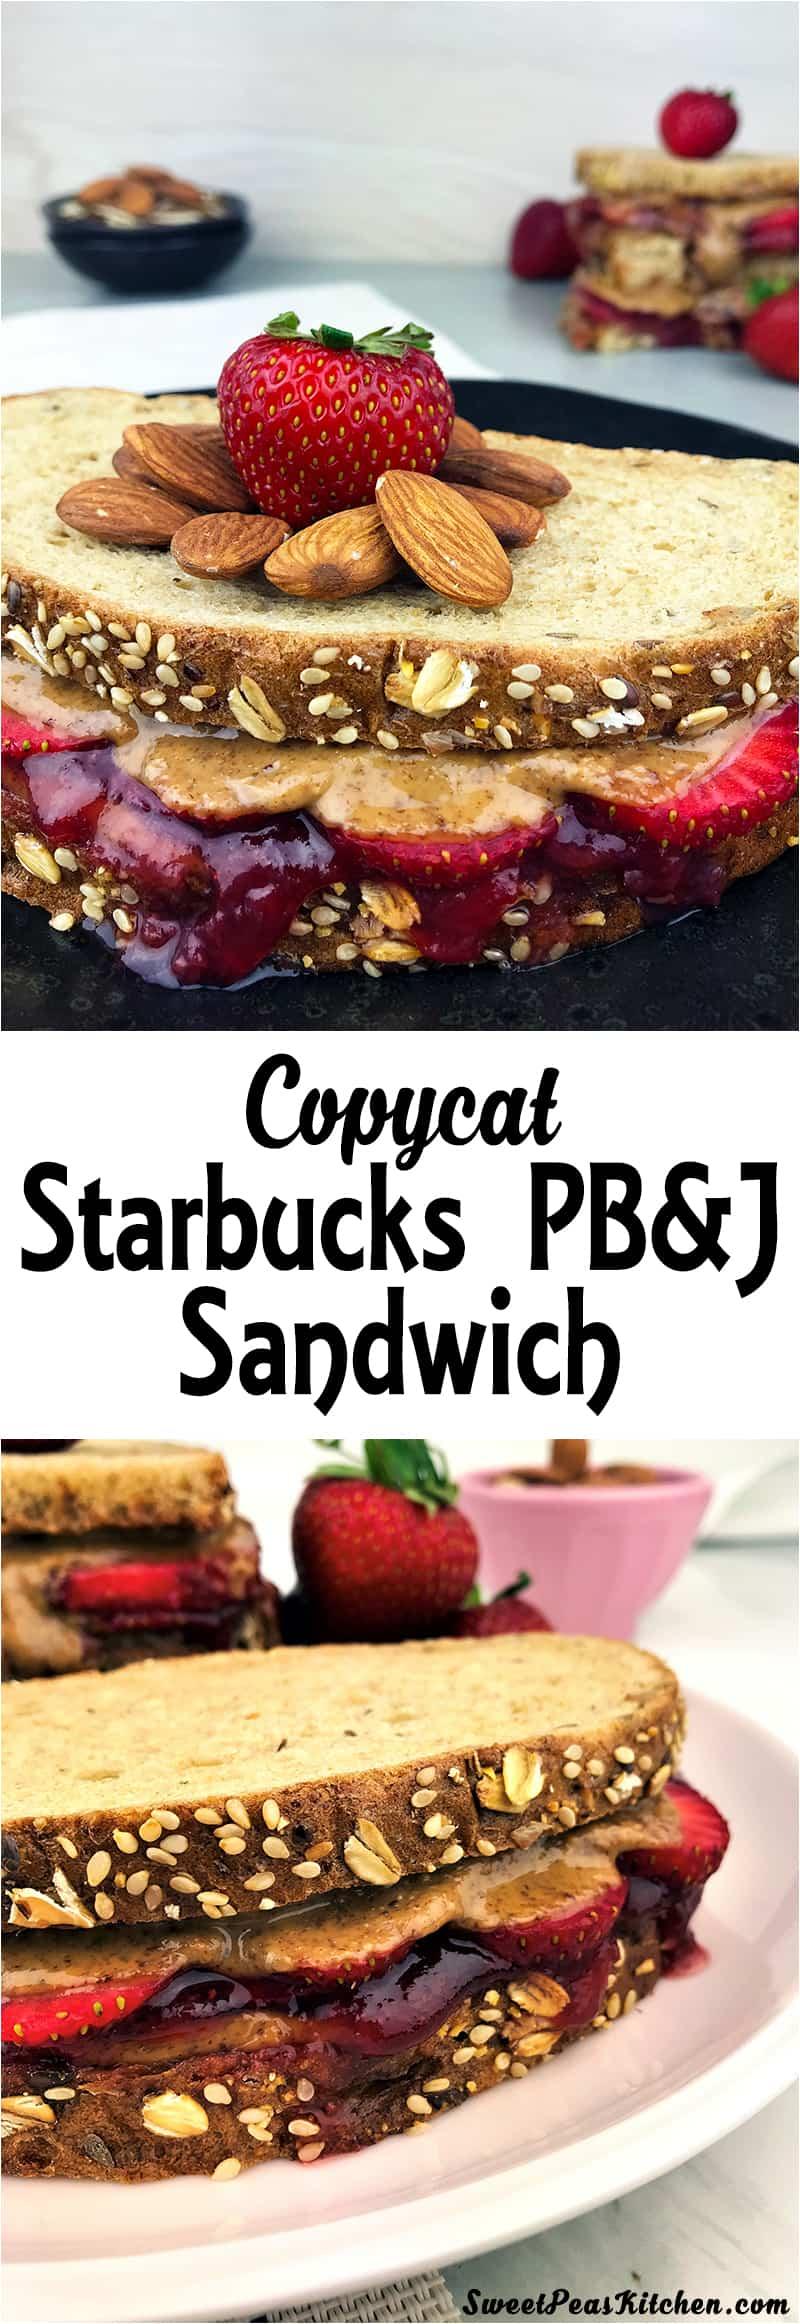 Copycat Starbucks PB&J Sandwich